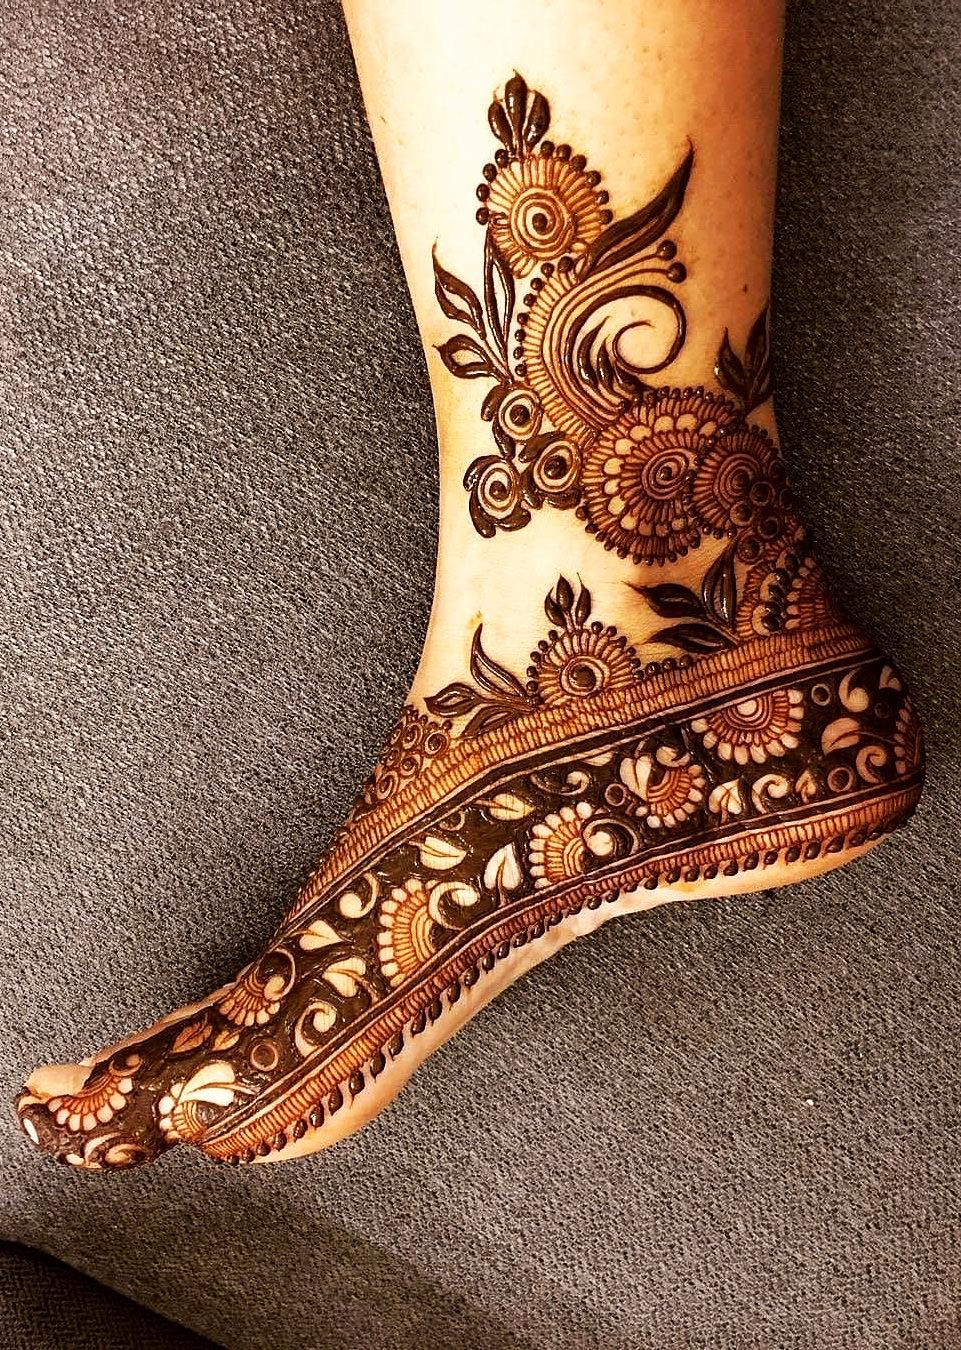 PunjabKesari, मेहंदीडिजाइन इमेज,BridalMehndi Designs for Foot, ब्राइडल मेहंदीडिजाइन फॉर फुट